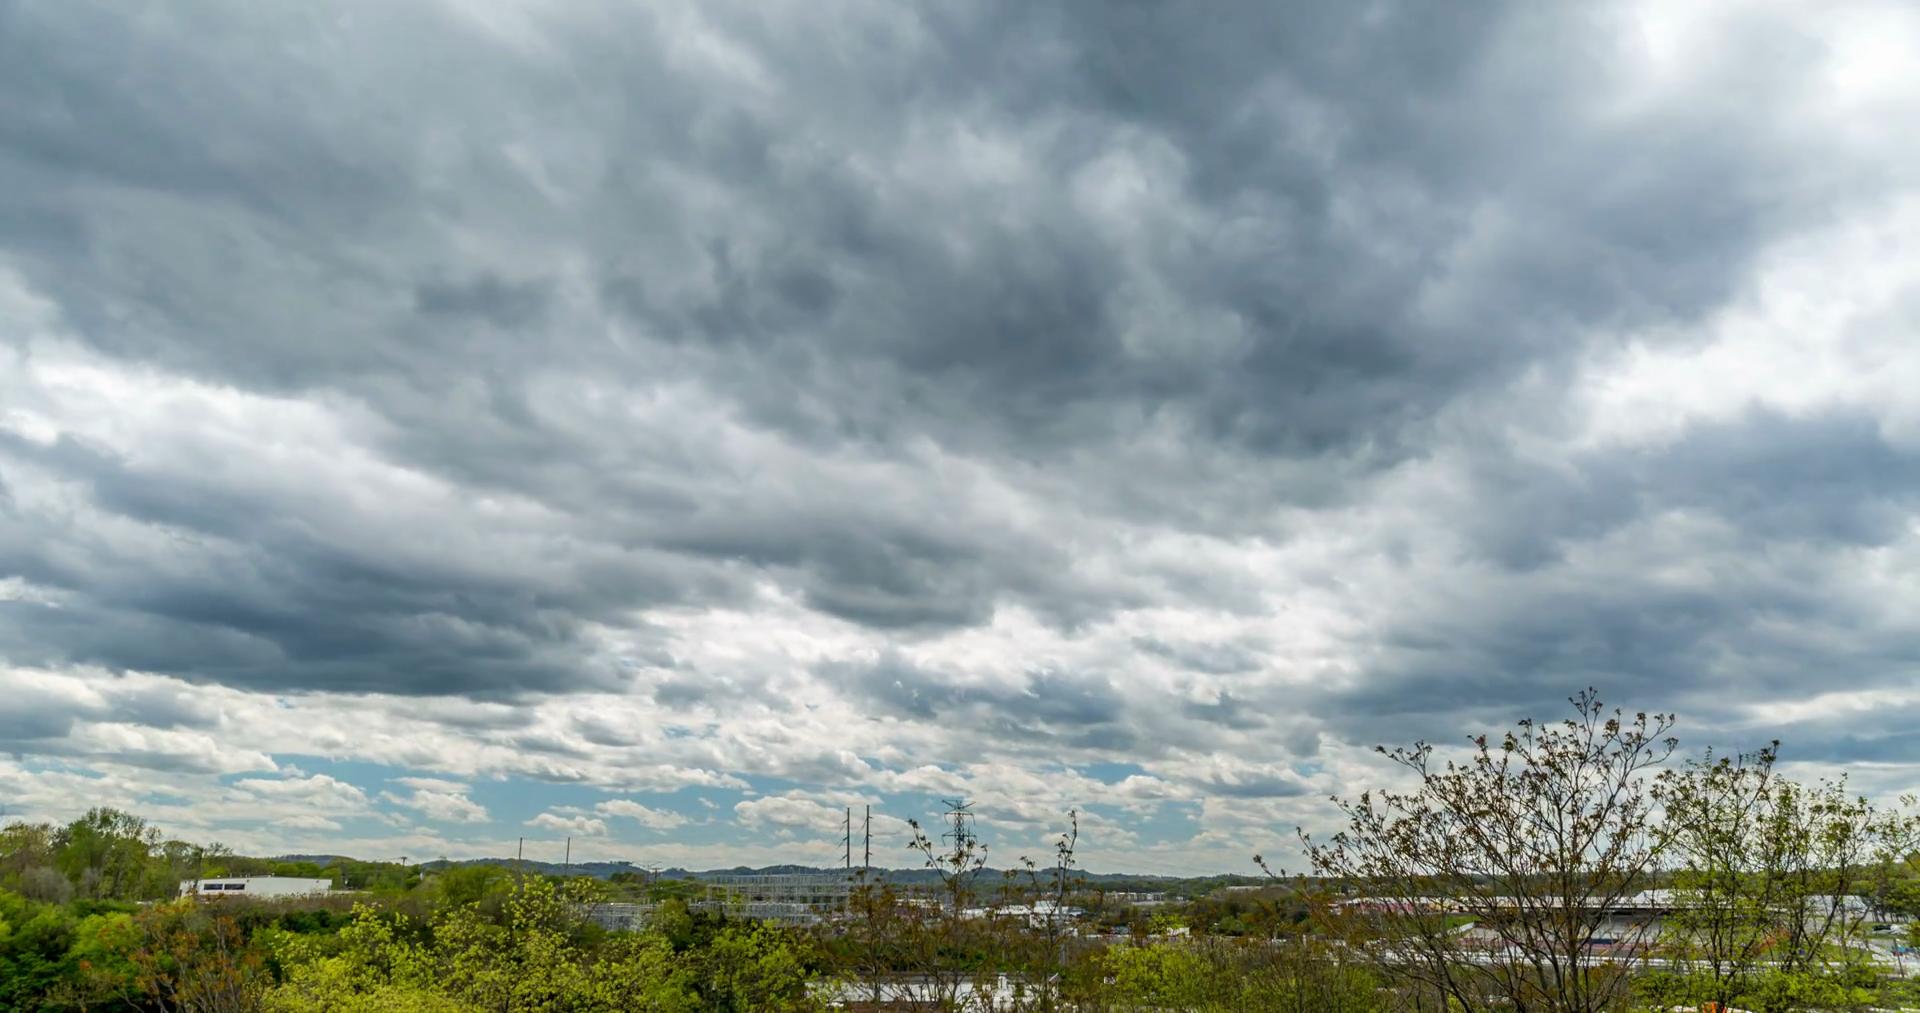 Nashville - Cloudy Sky - Timelapse Stock Video Footage - VideoBlocks